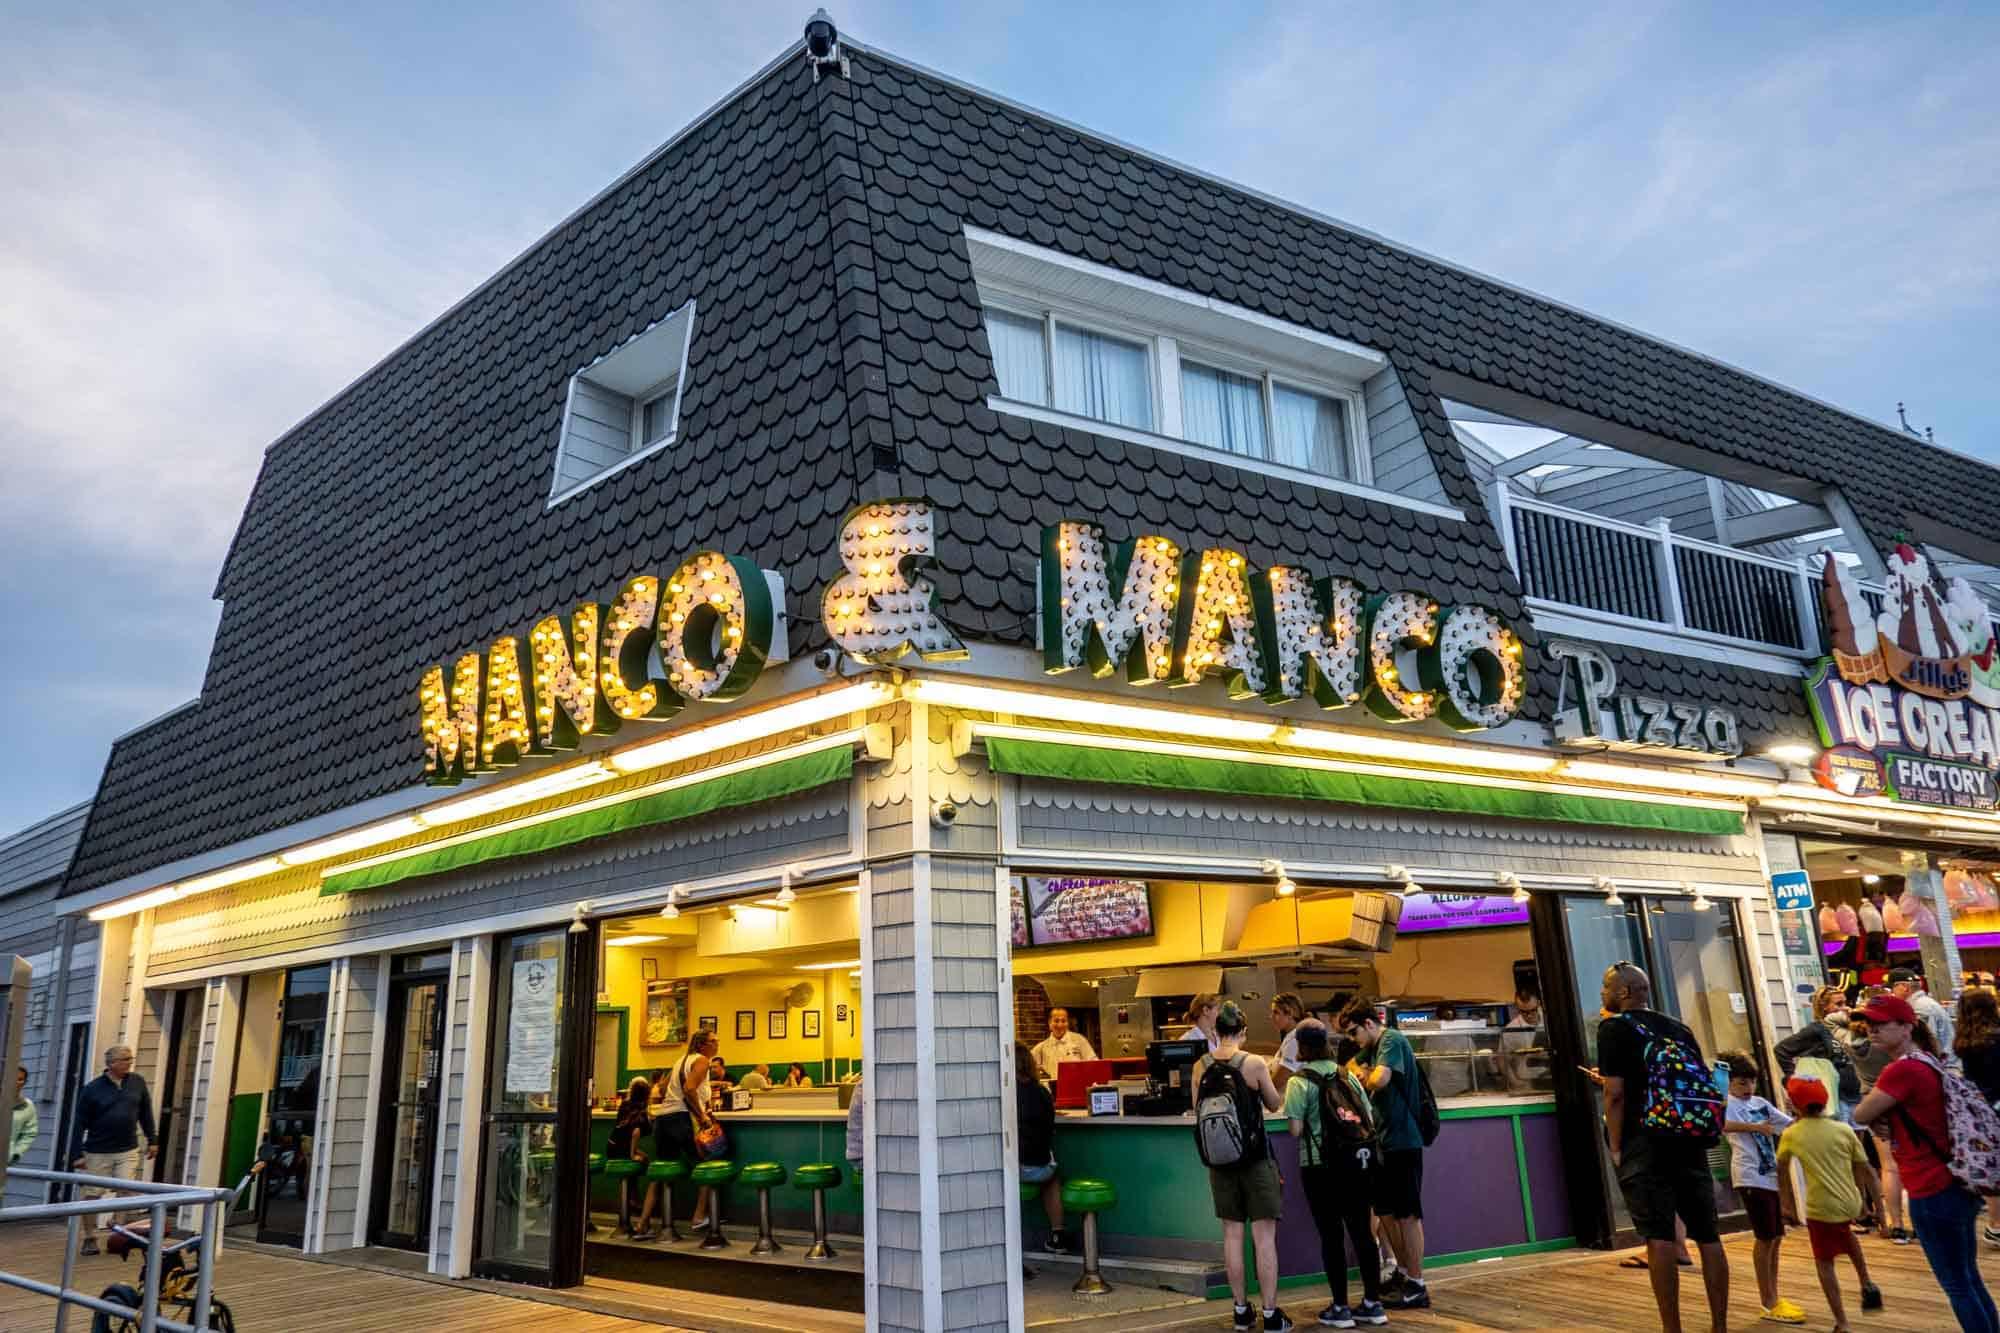 Exterior of Manco & Manco Pizza